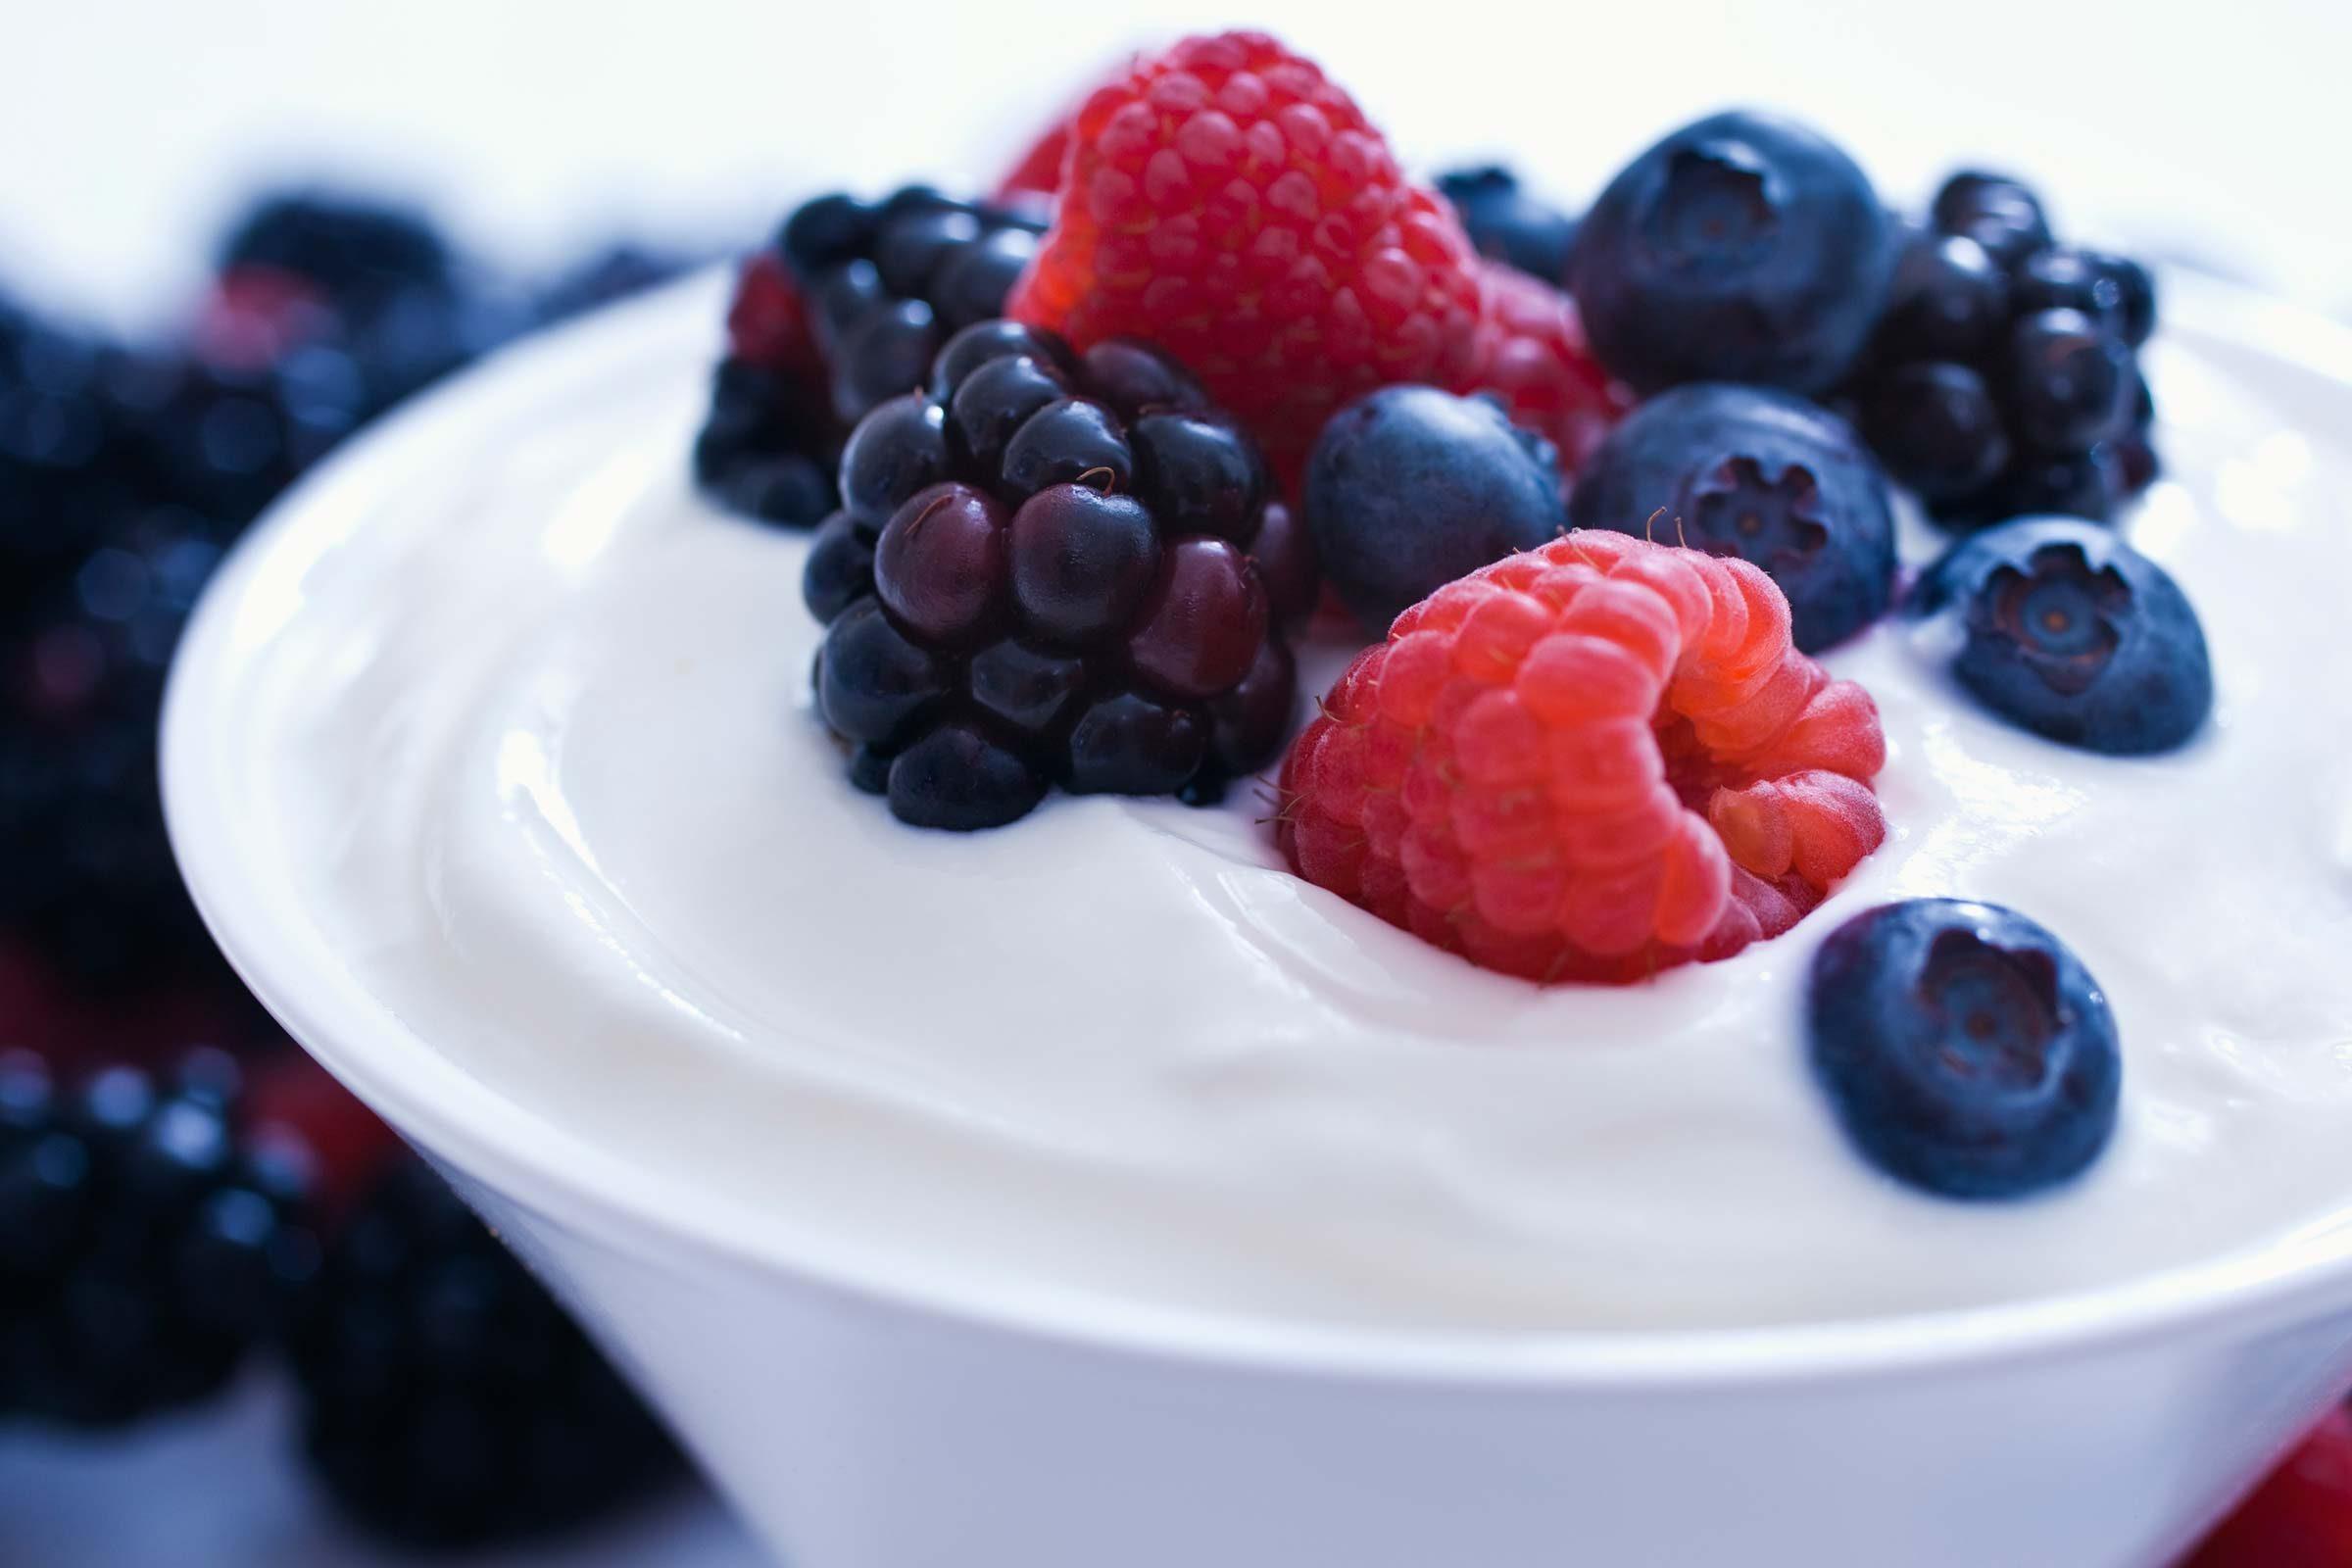 01-yogurt-foods-with-more-sugar